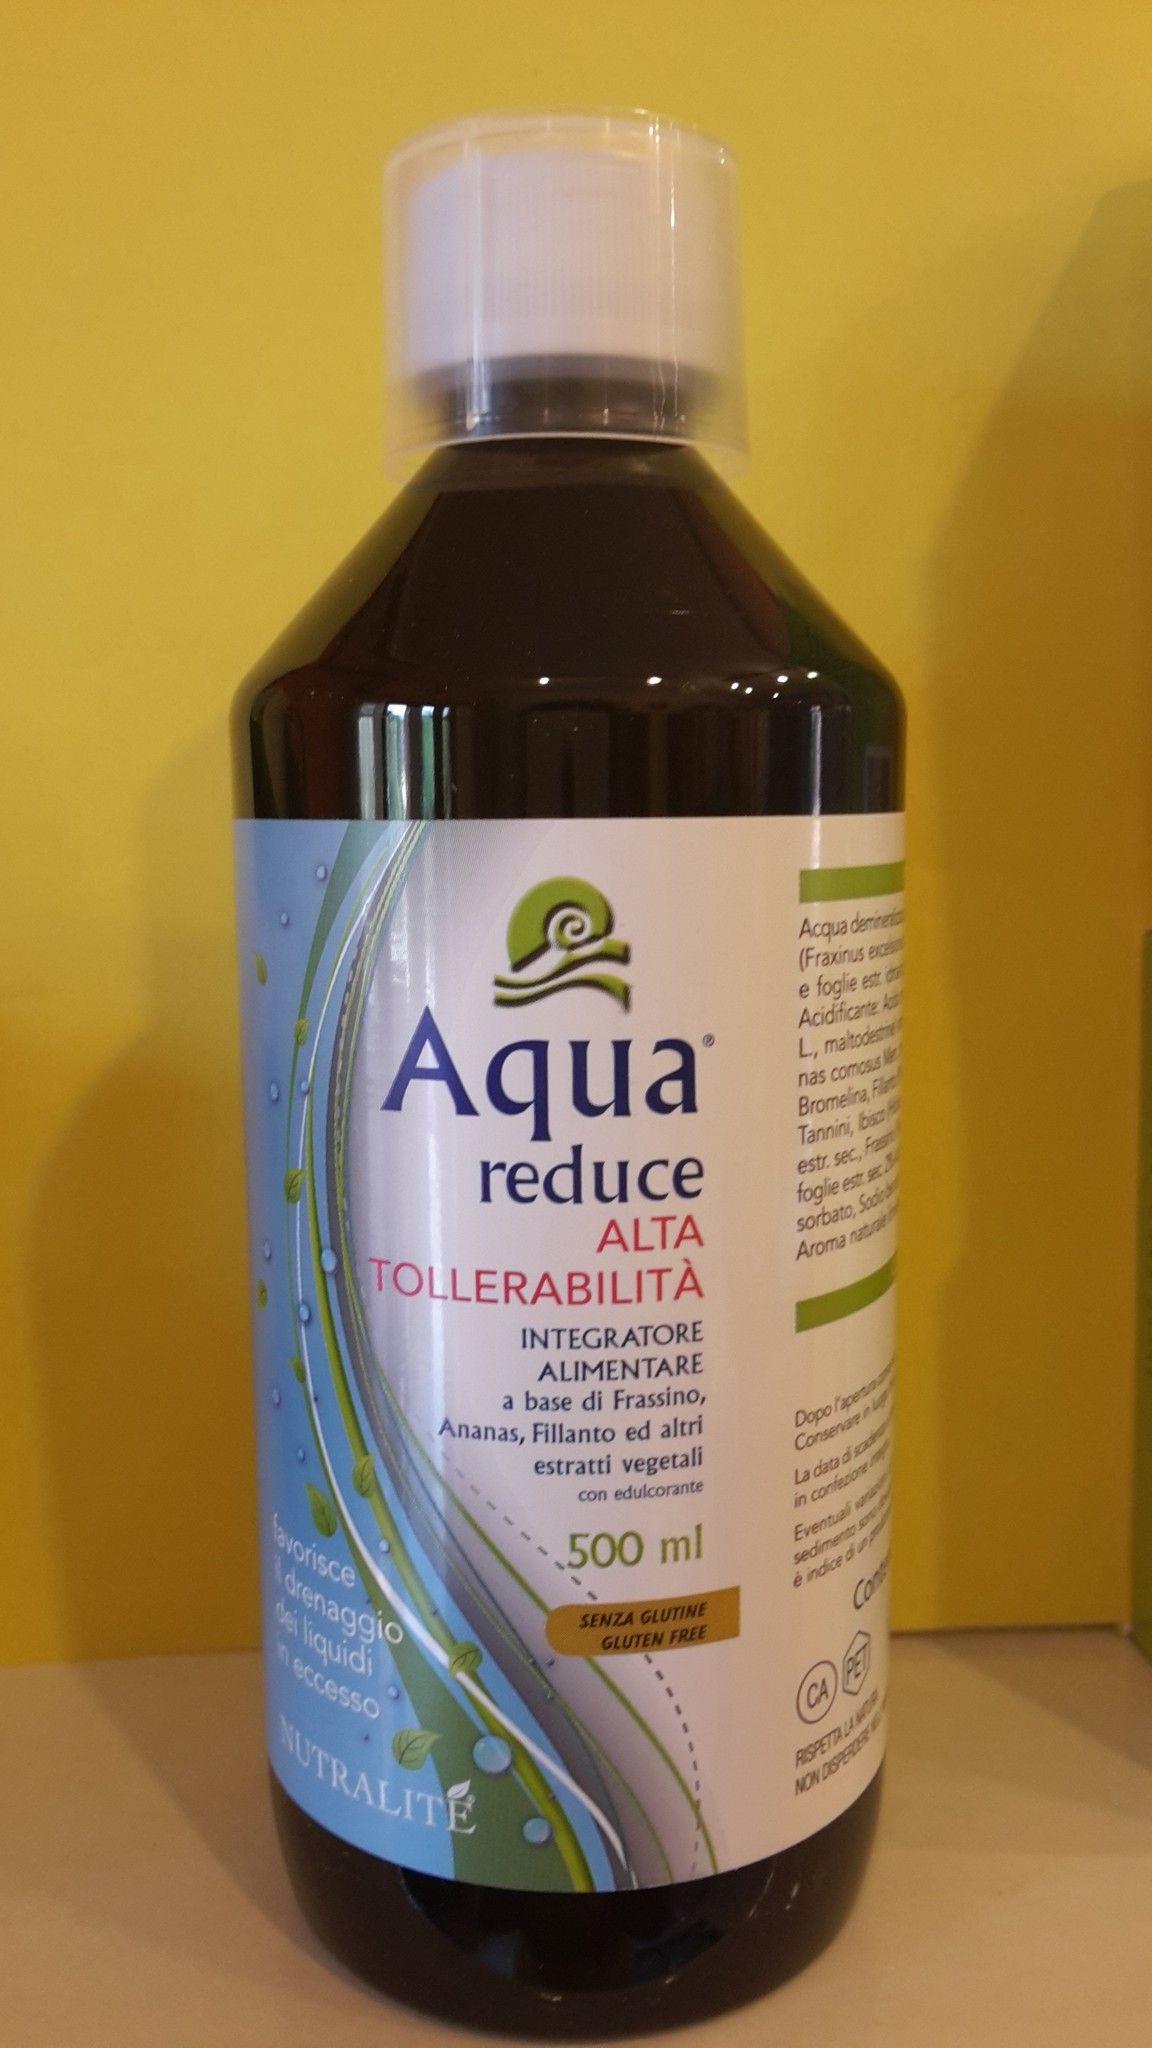 AQUA  Reduce Drenante Alta Tollerabilita' 500 ml - Farmaderbe